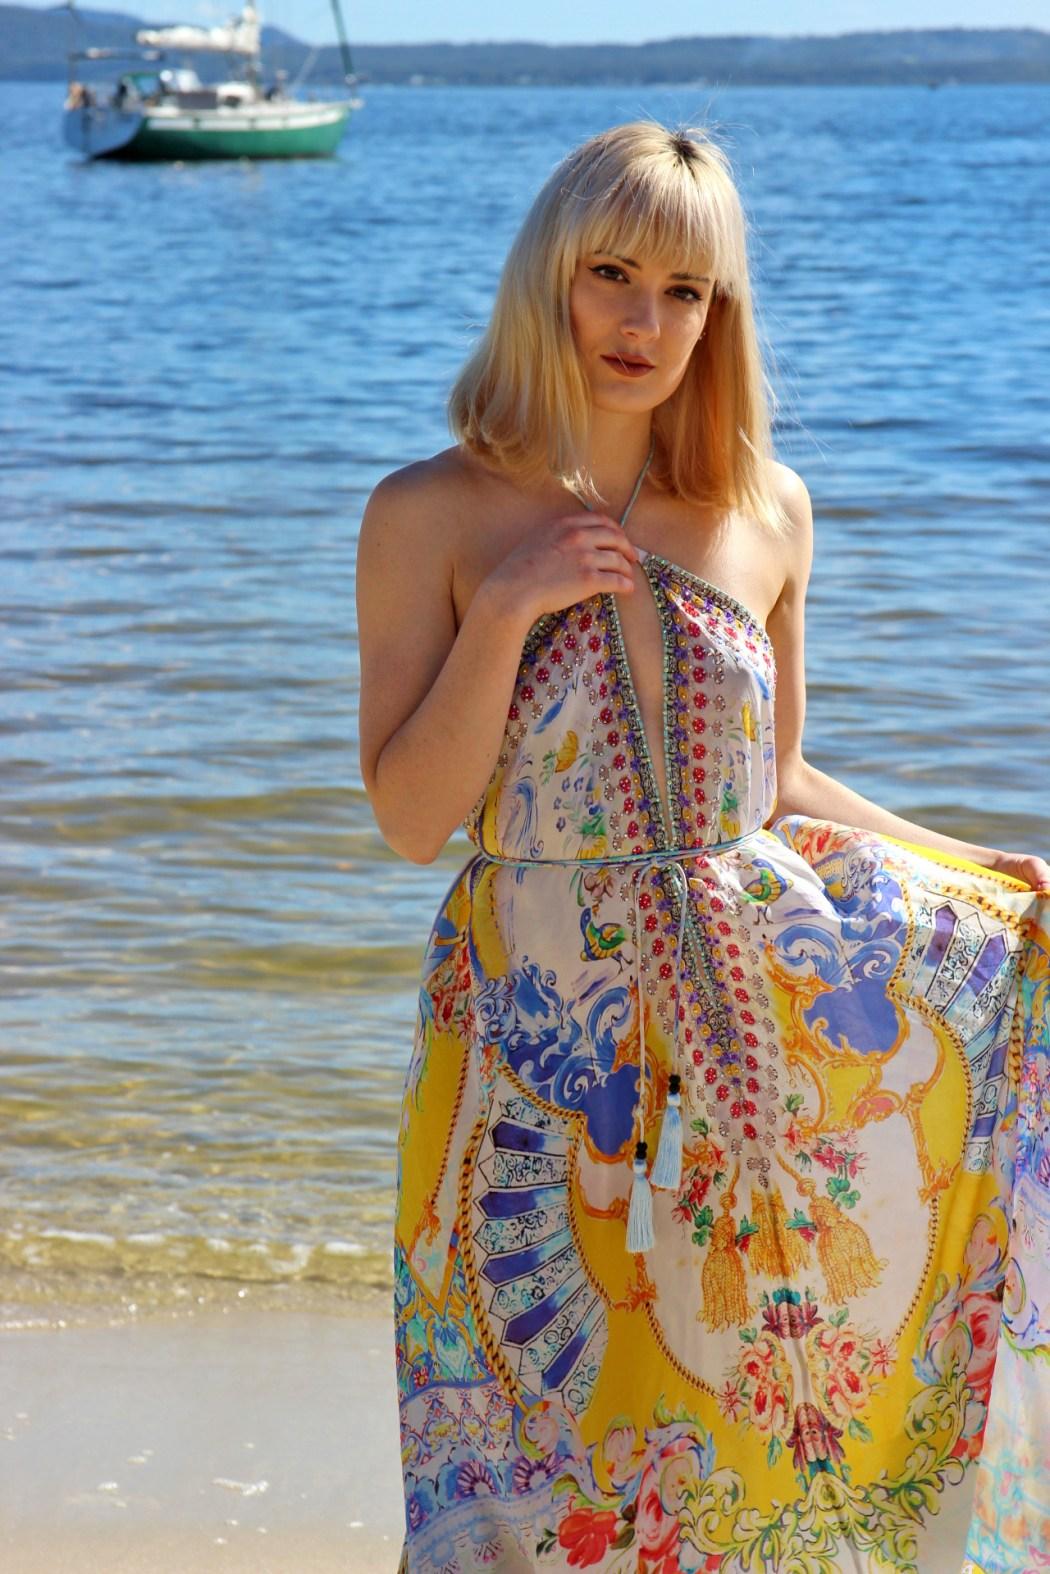 czarina love in santorini 3 way dress